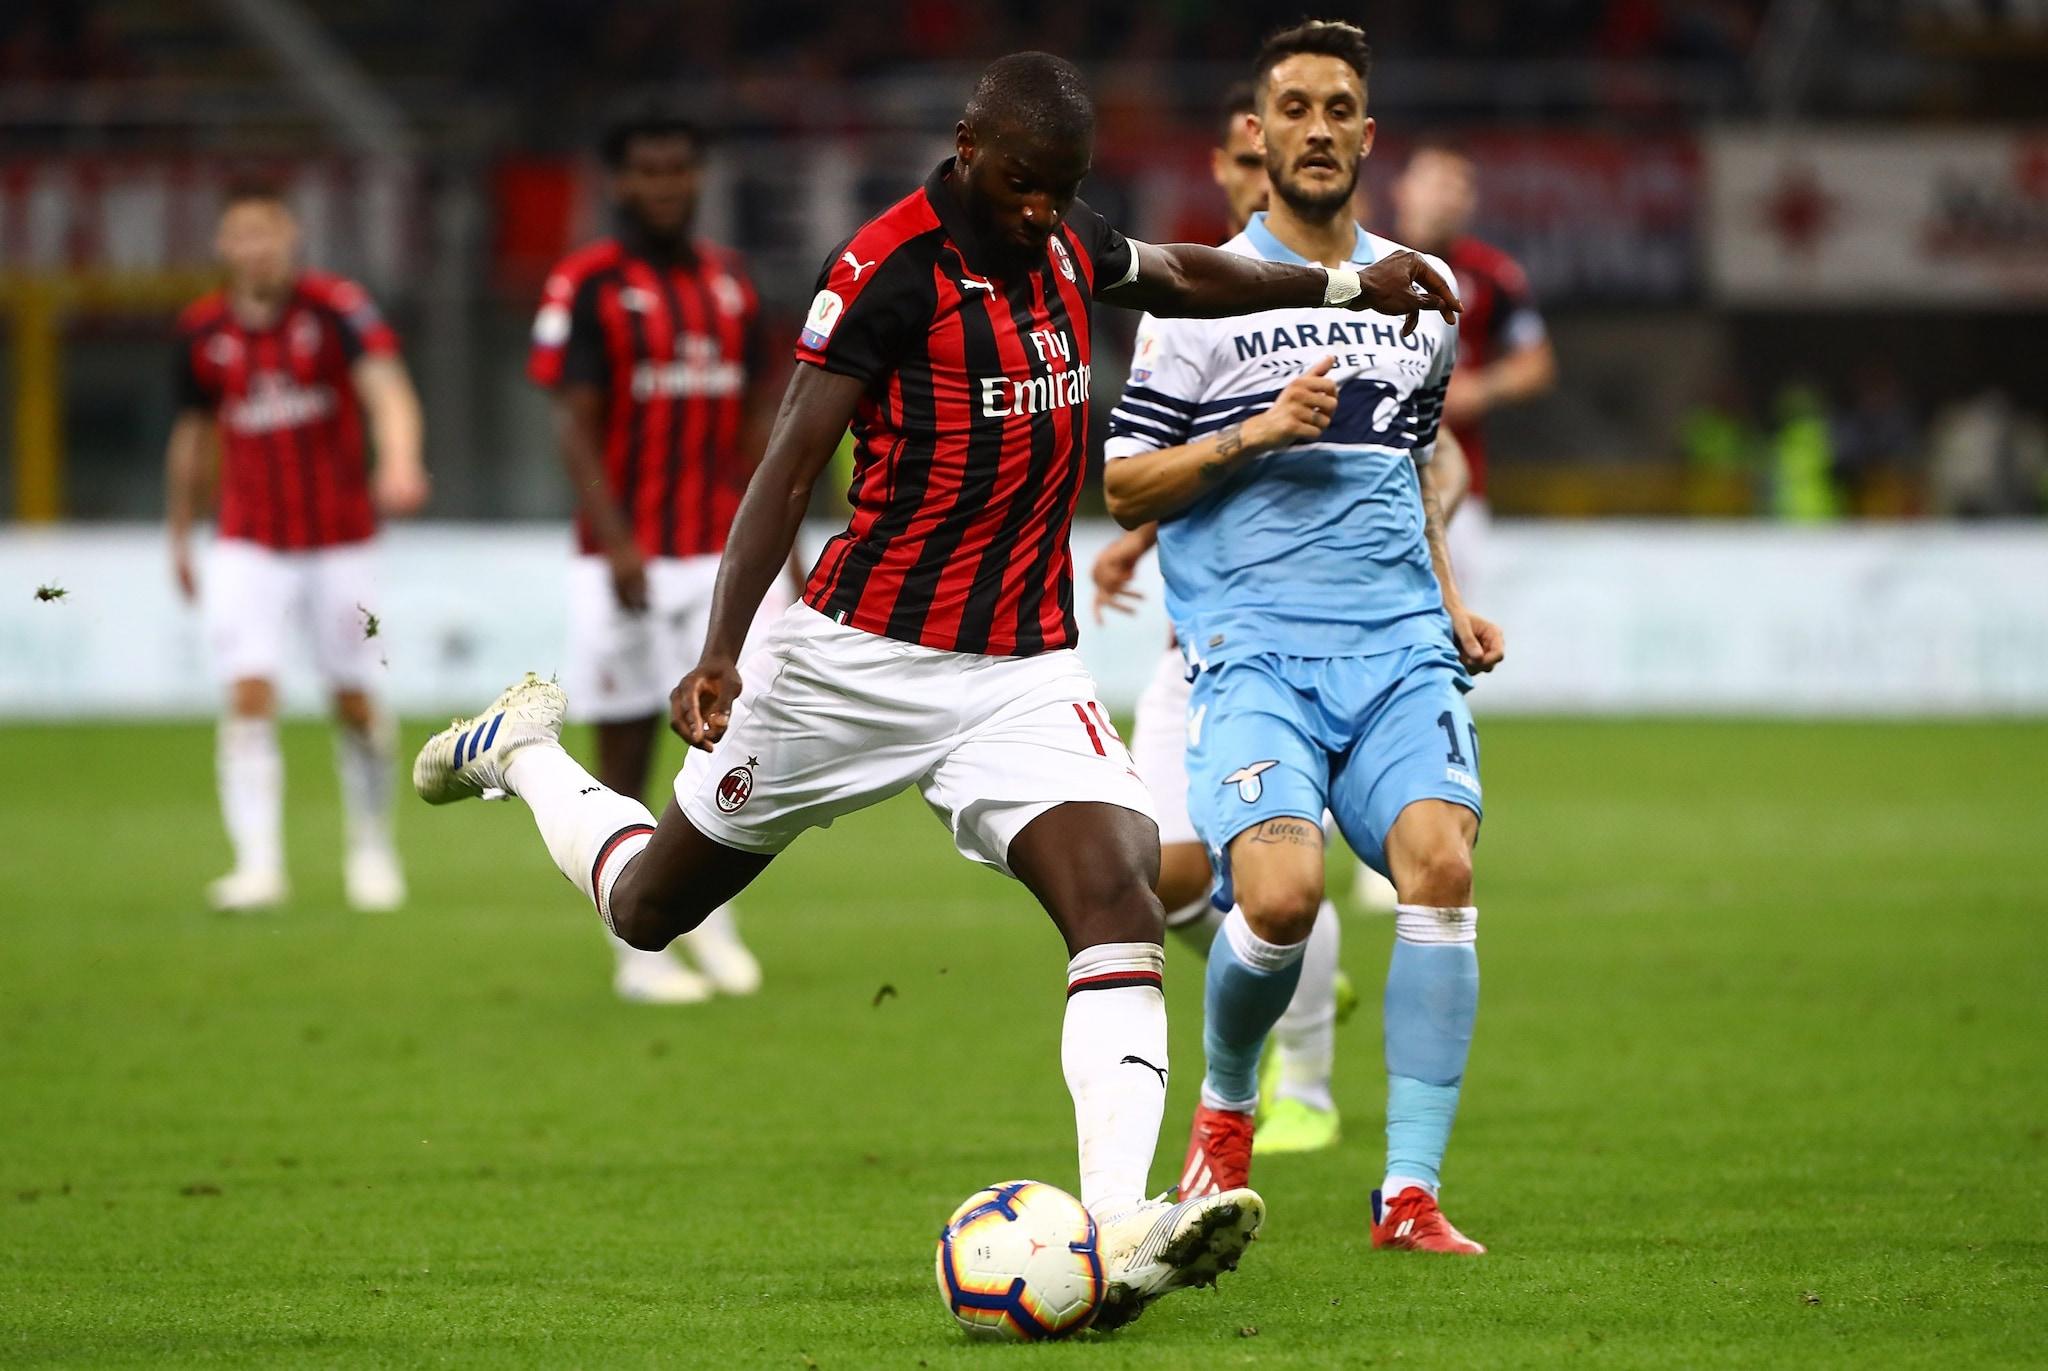 Bakayoko torna titolare con il Milan.